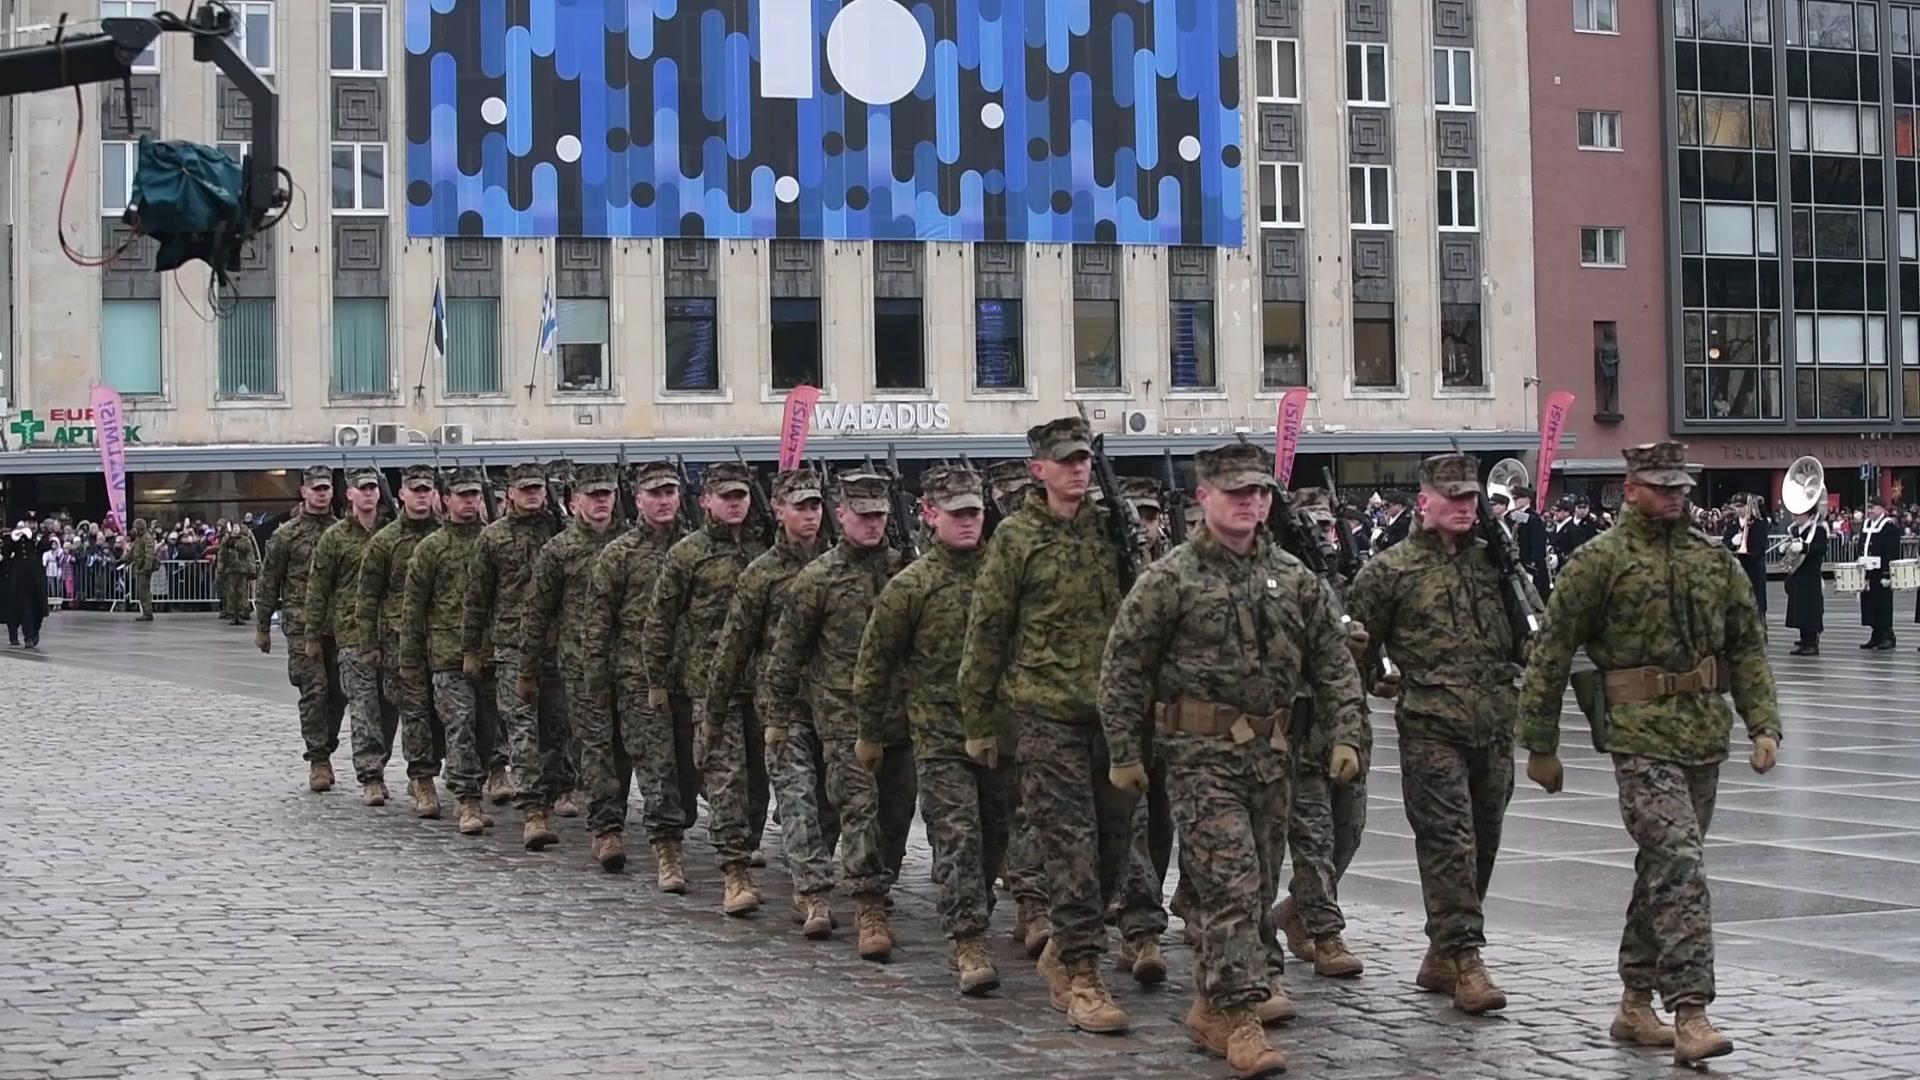 DVIDS - Video - Estonia Independence Day Parade 2019 (TV